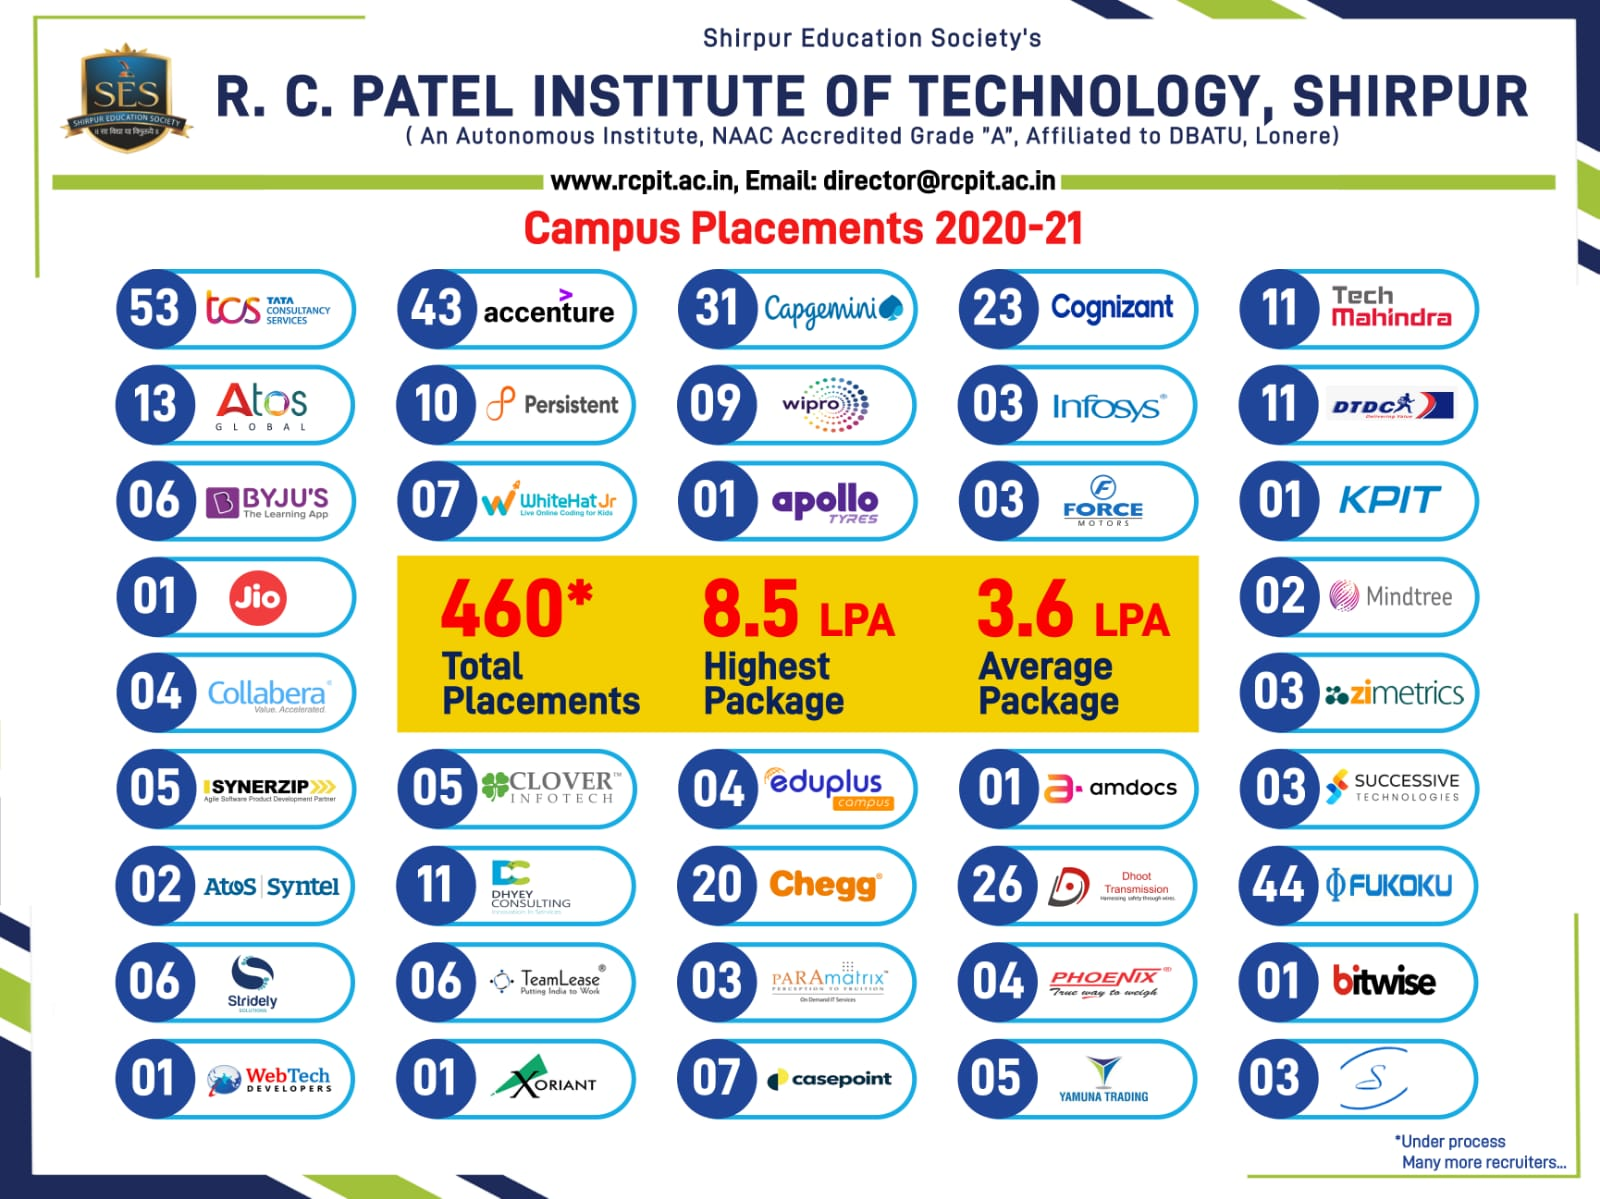 Campus Placement 2020-21